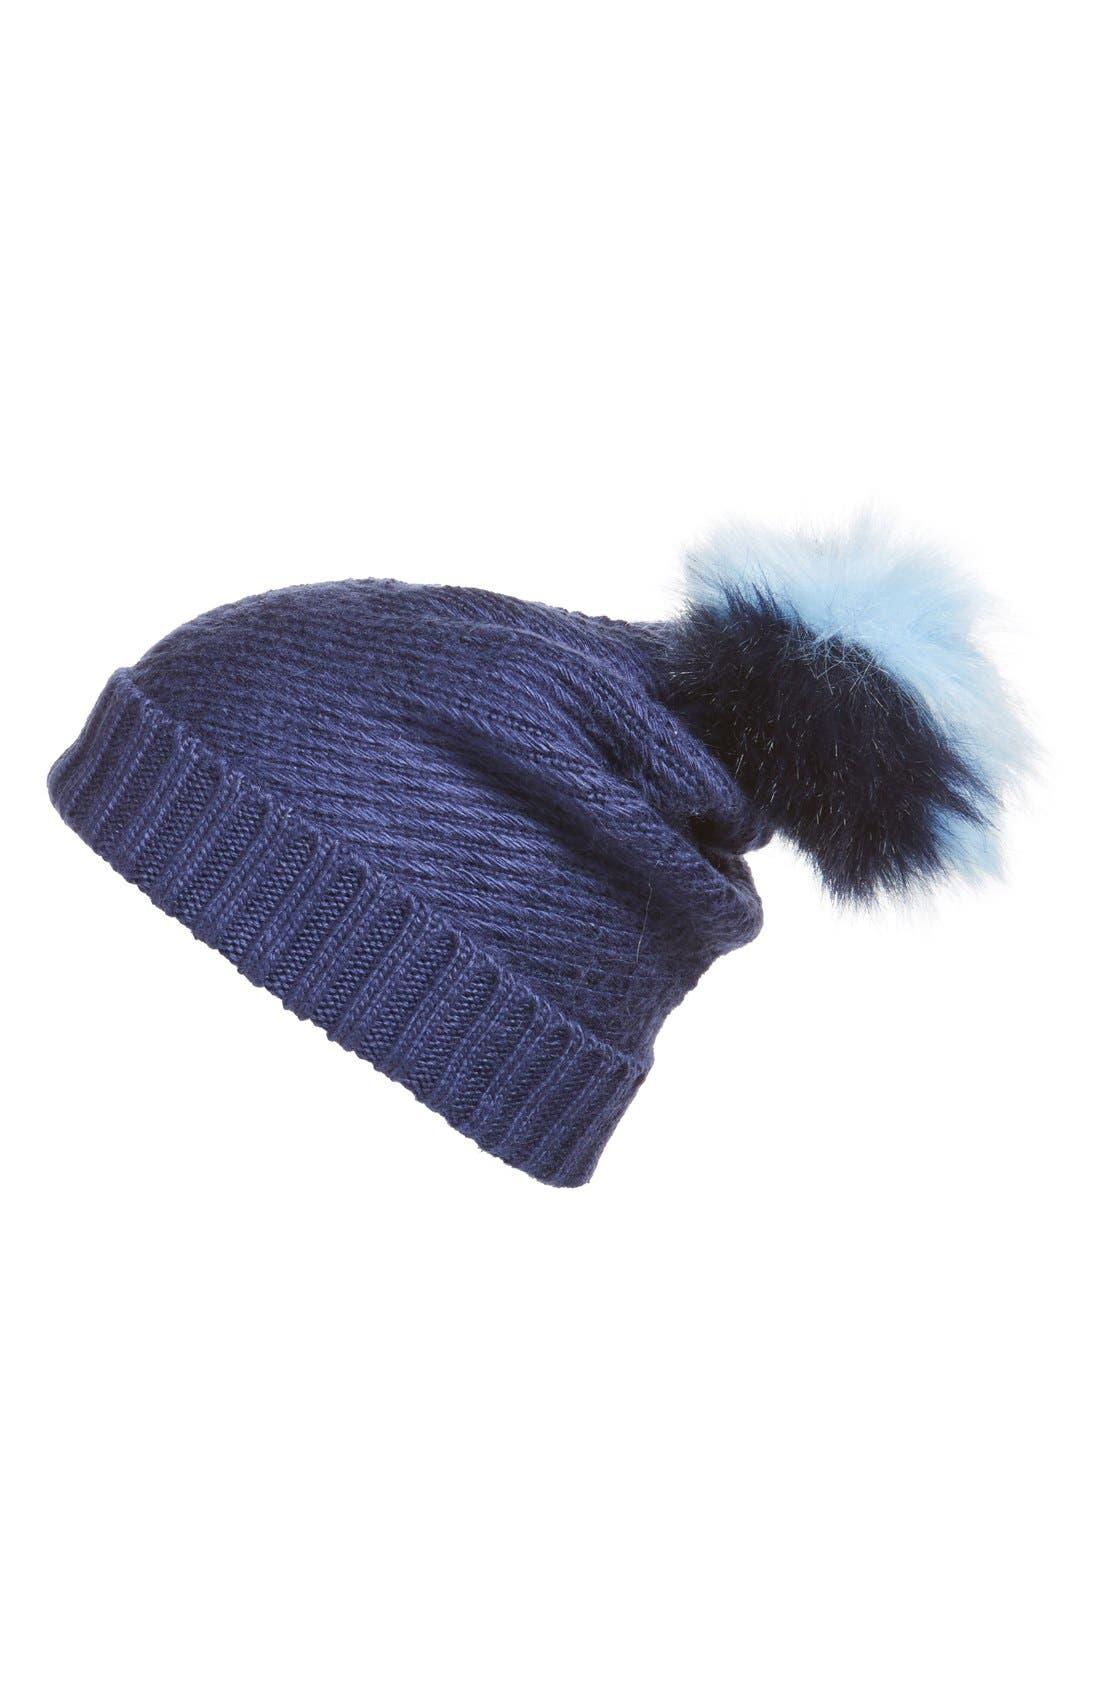 Main Image - BCBG Faux Fur Pompom Knit Beanie